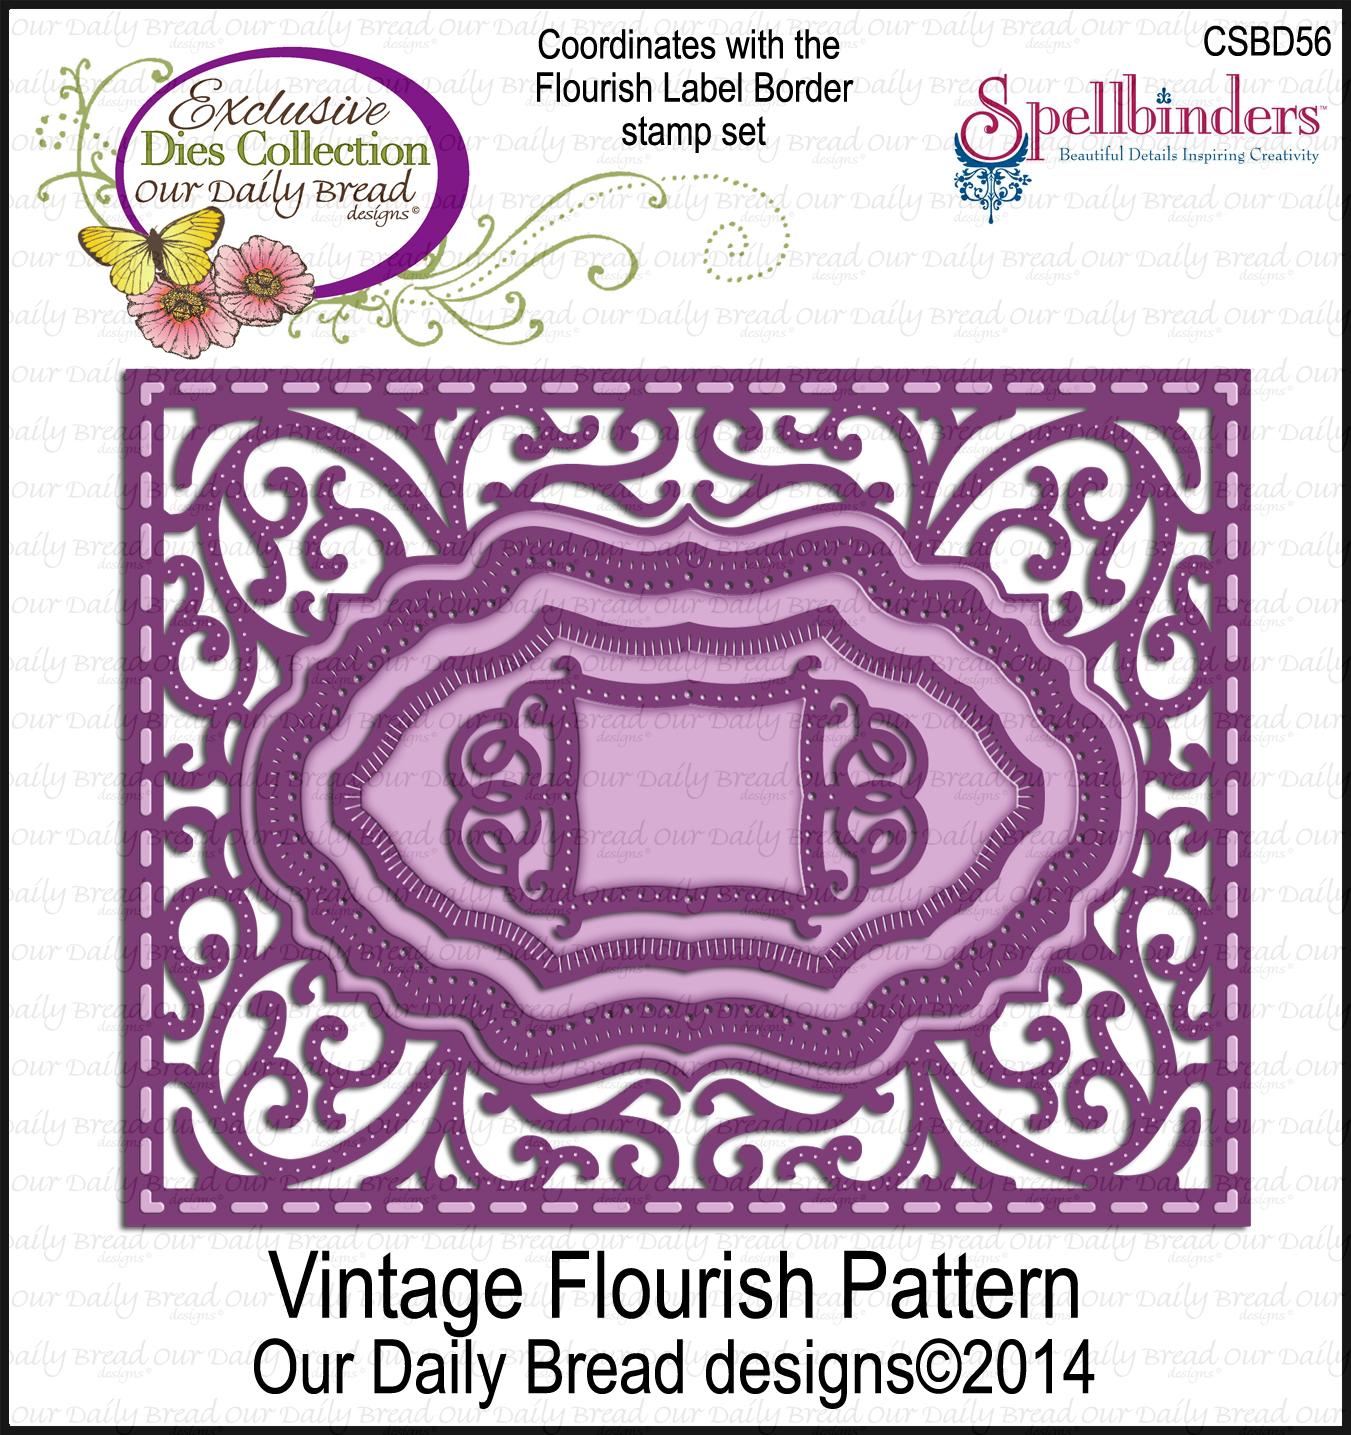 http://www.ourdailybreaddesigns.com/index.php/csbd56-vintage-flourish-pattern-dies.html